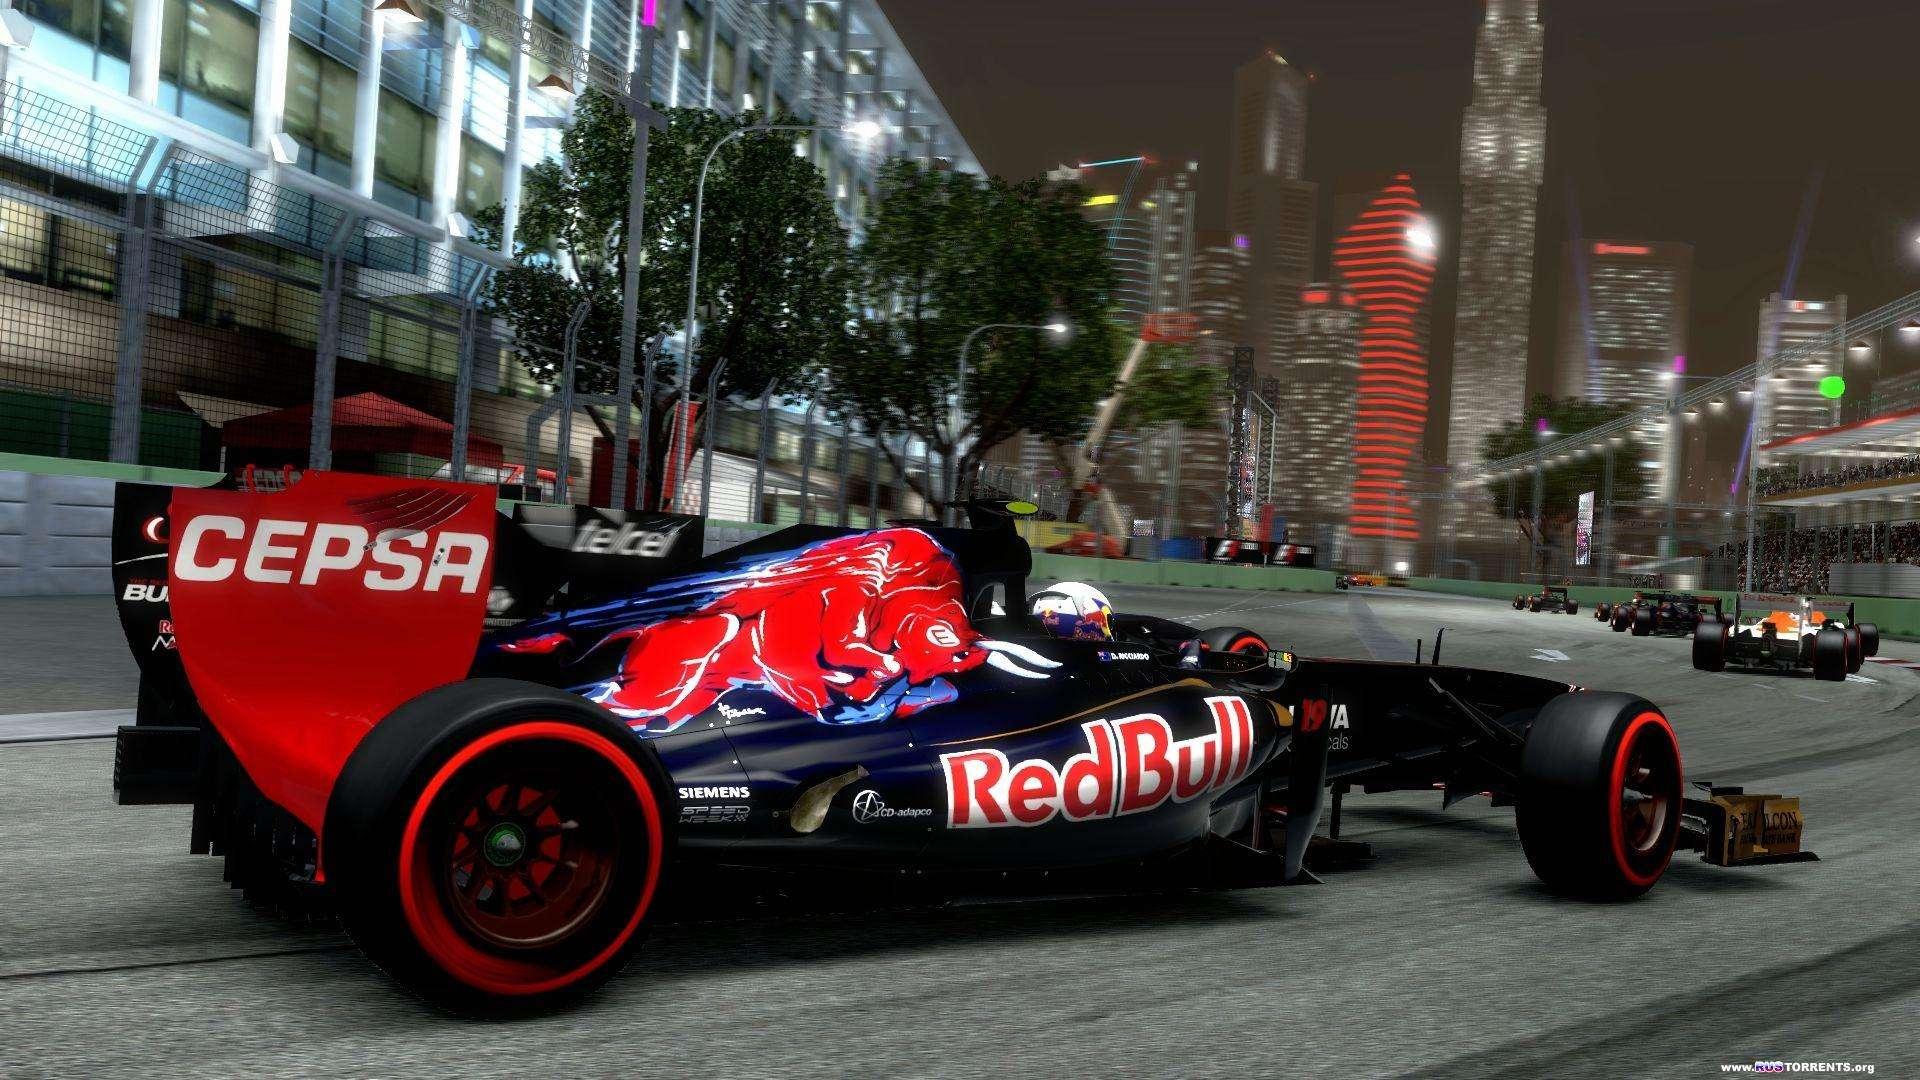 F1 2013. Classic Edition [v 1.0.0.6 + 3 DLC] | PC | RePack �� Brick